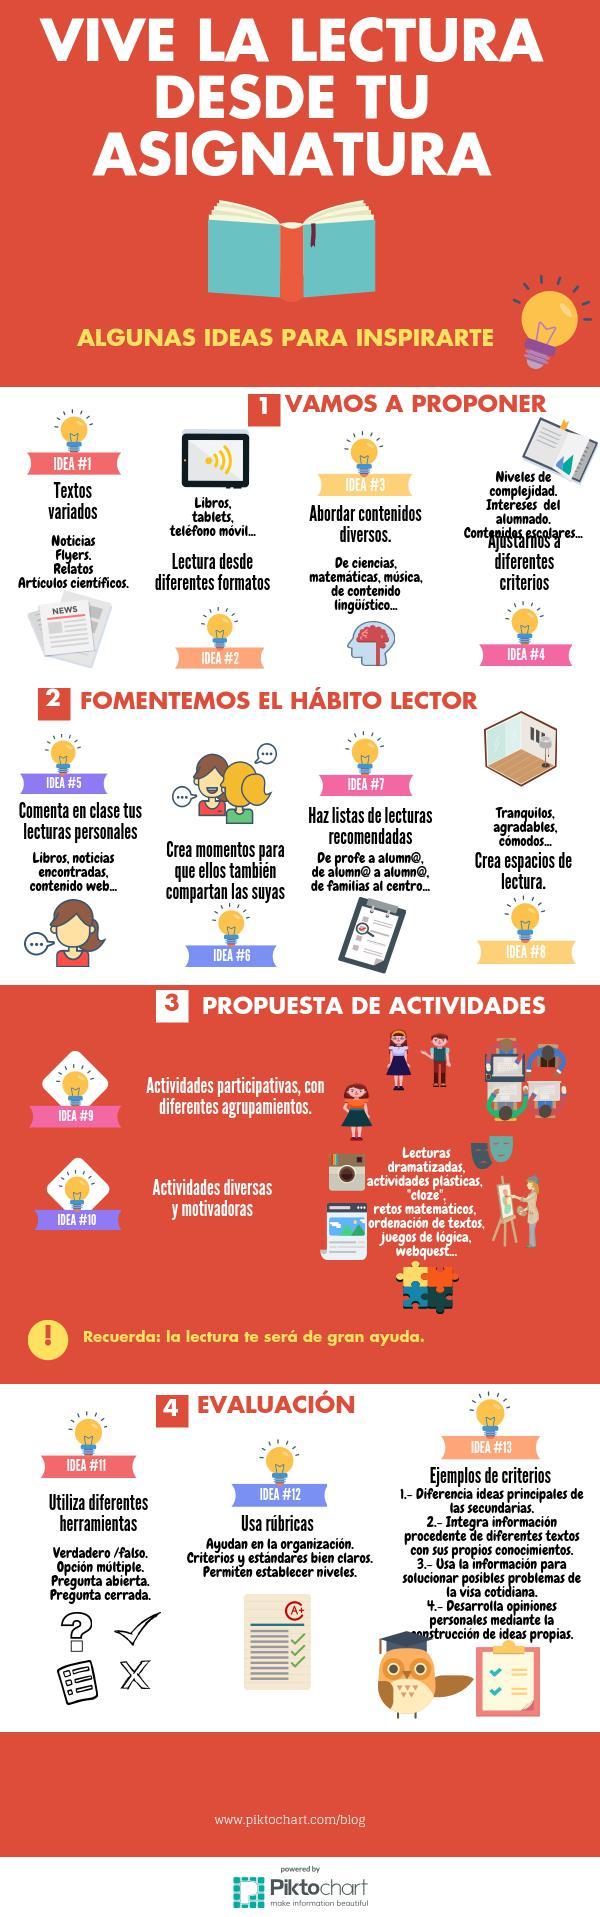 Acuerdo Lector MacPRofe | @Piktochart Infographic